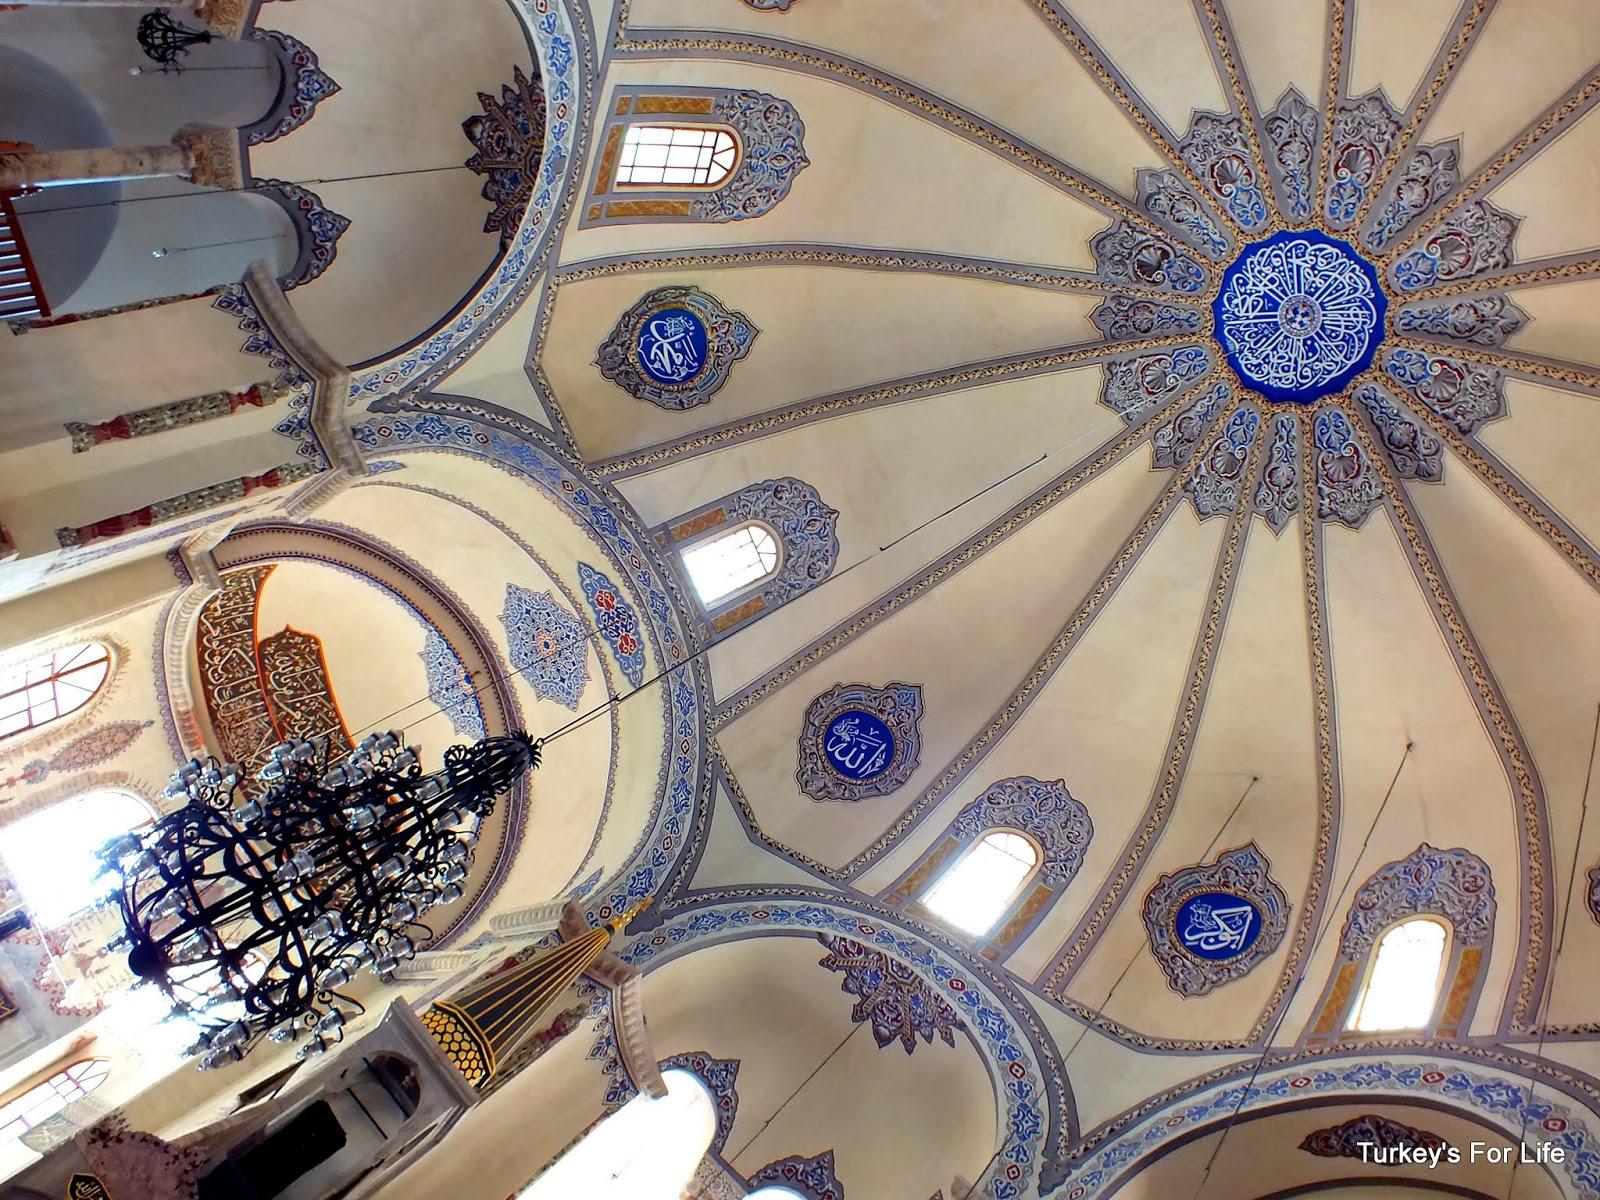 Istanbul: Küçük Ayasofya Camii - We Rather Liked You ...